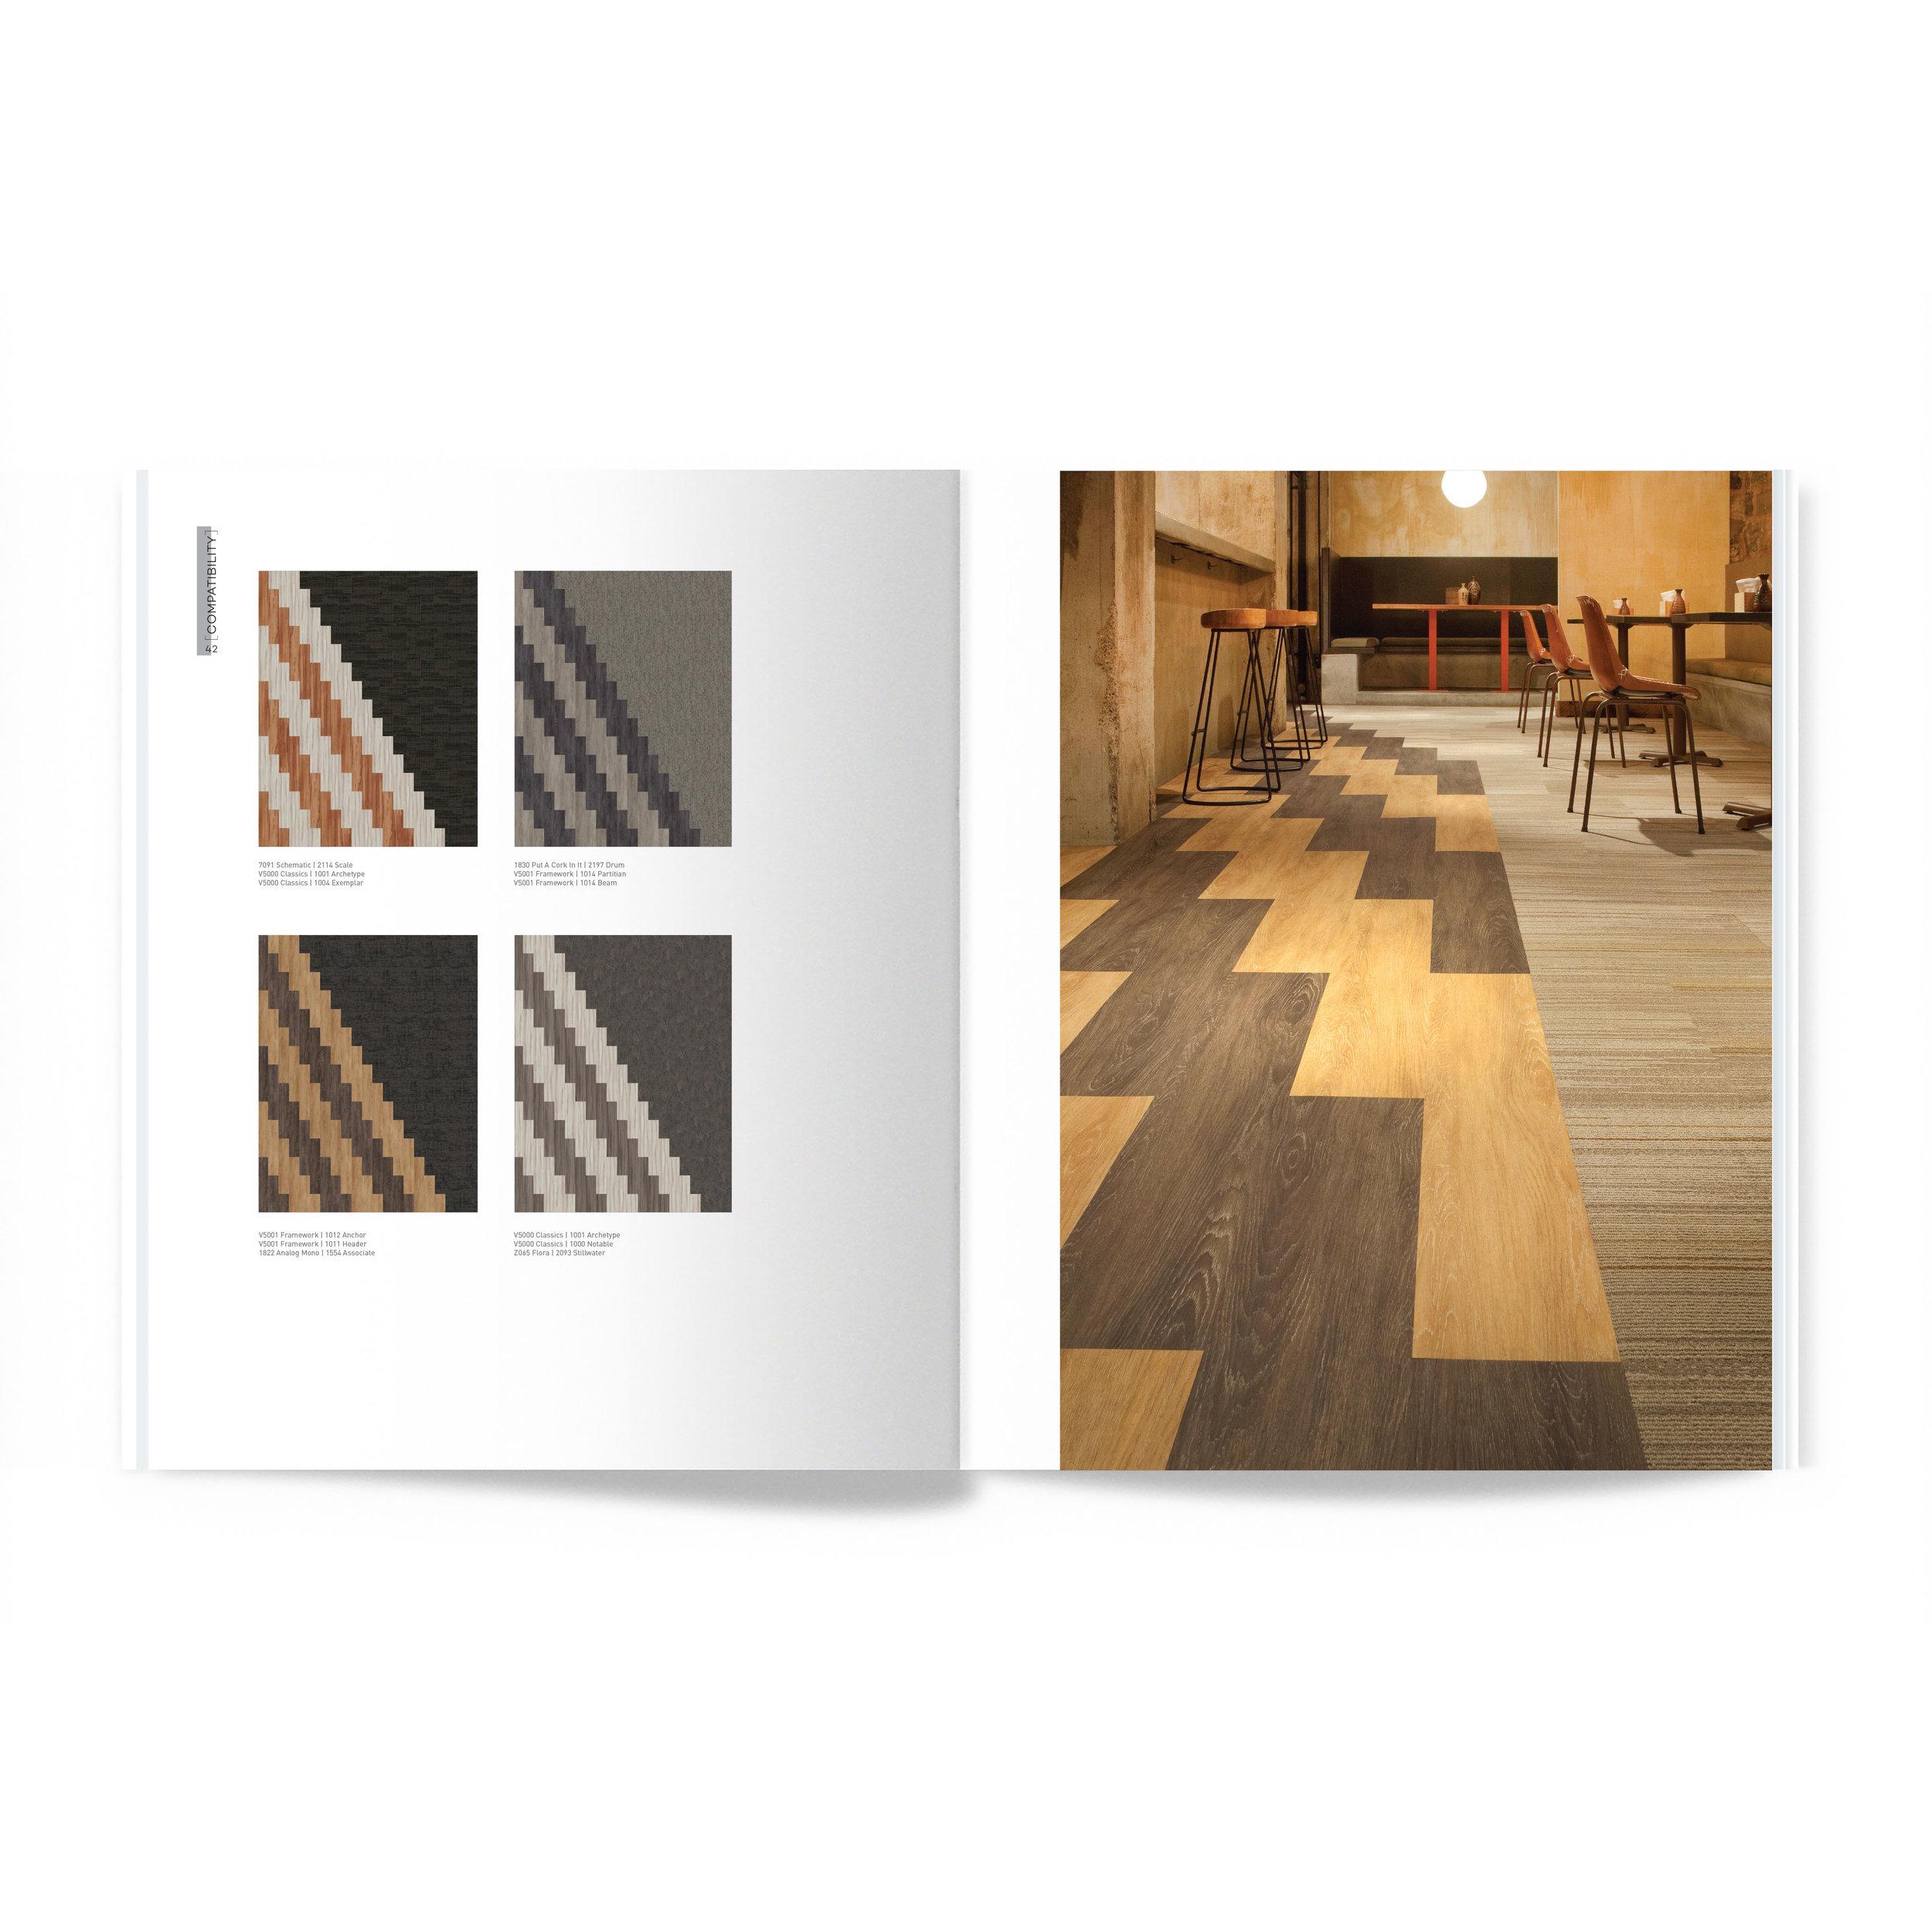 Shift Vol. 3 J+J Flooring spread images publication layout